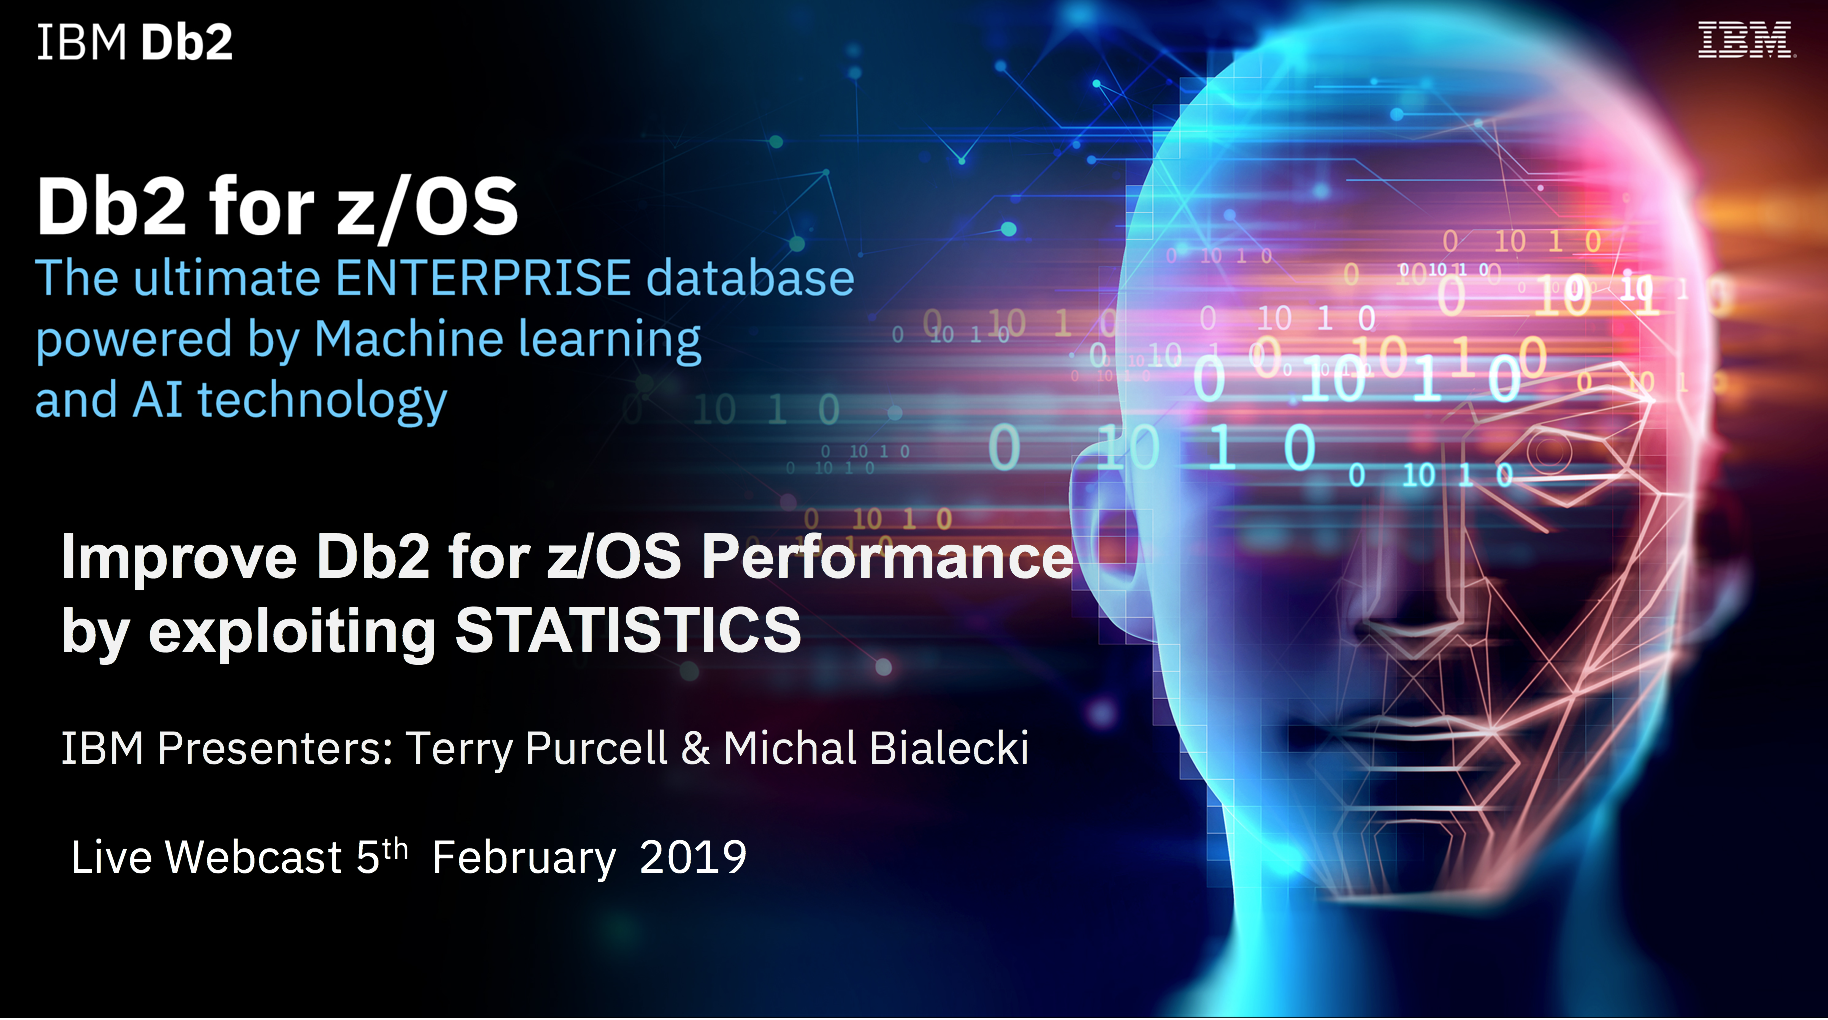 Improve Db2 Performance by understanding Statistics